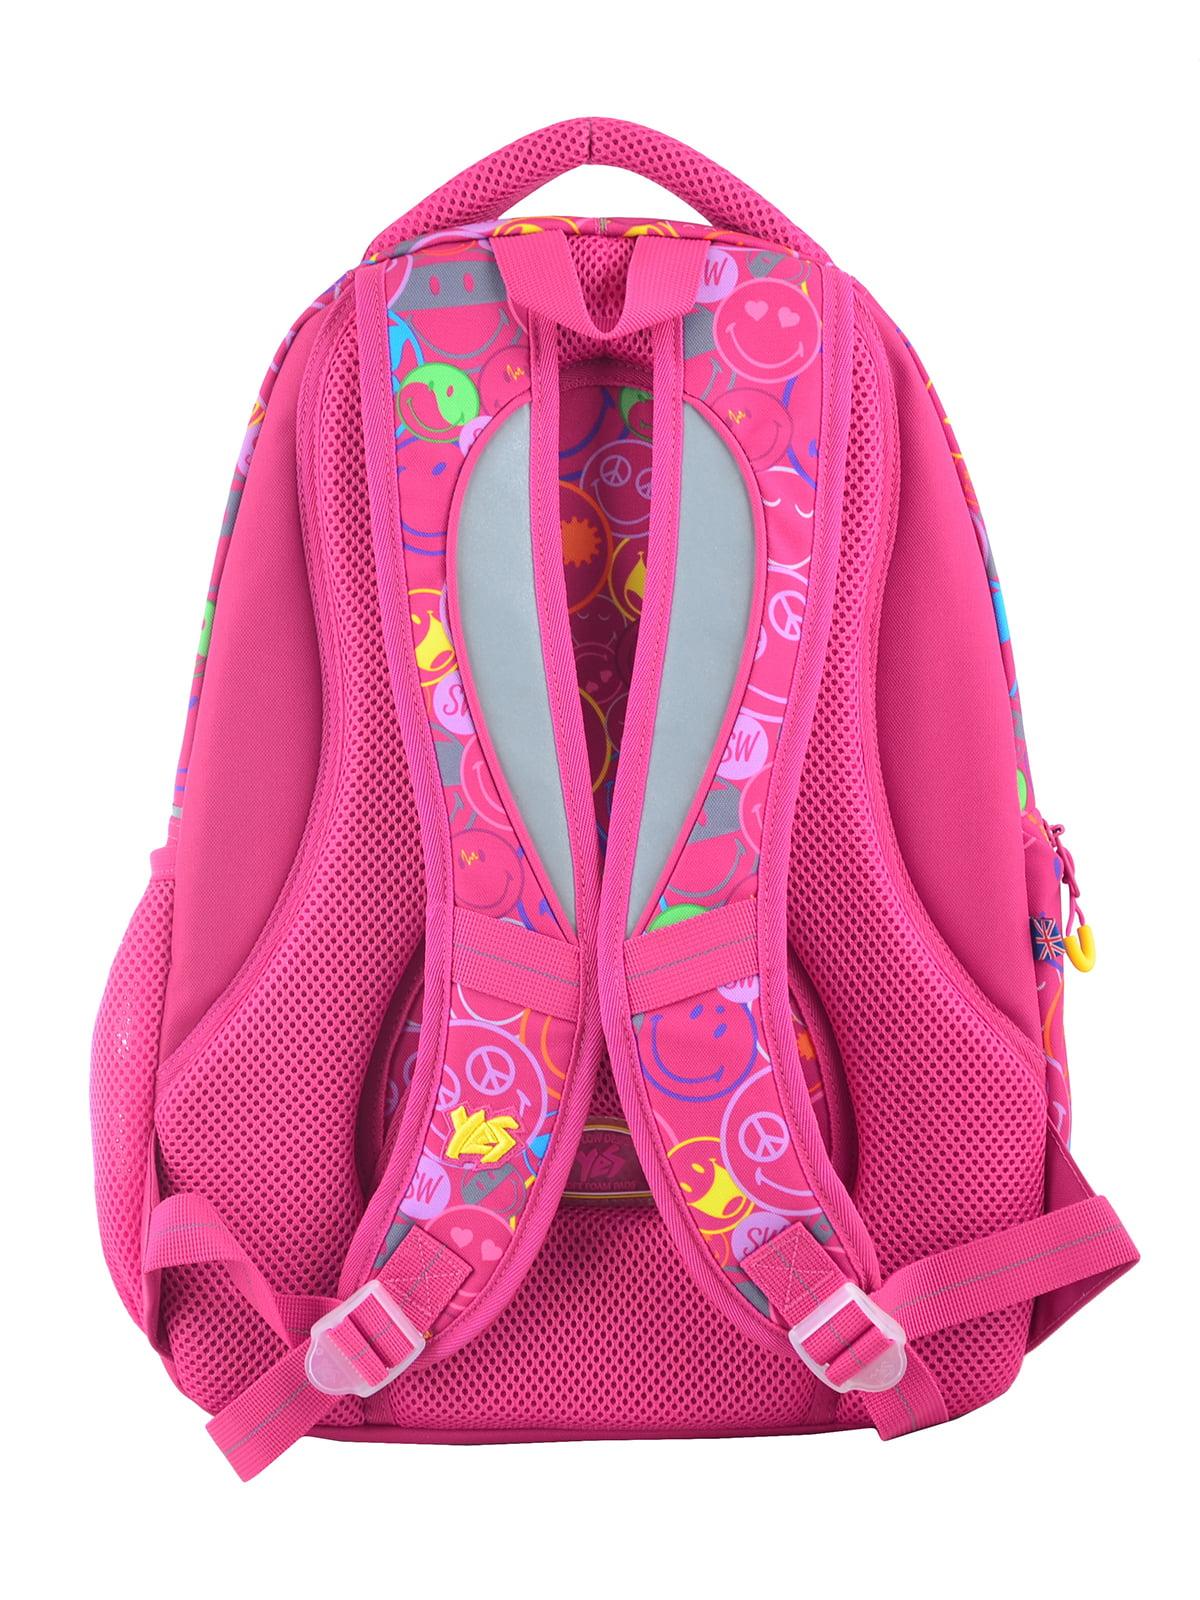 Рюкзак рожевий в принт | 4214930 | фото 4